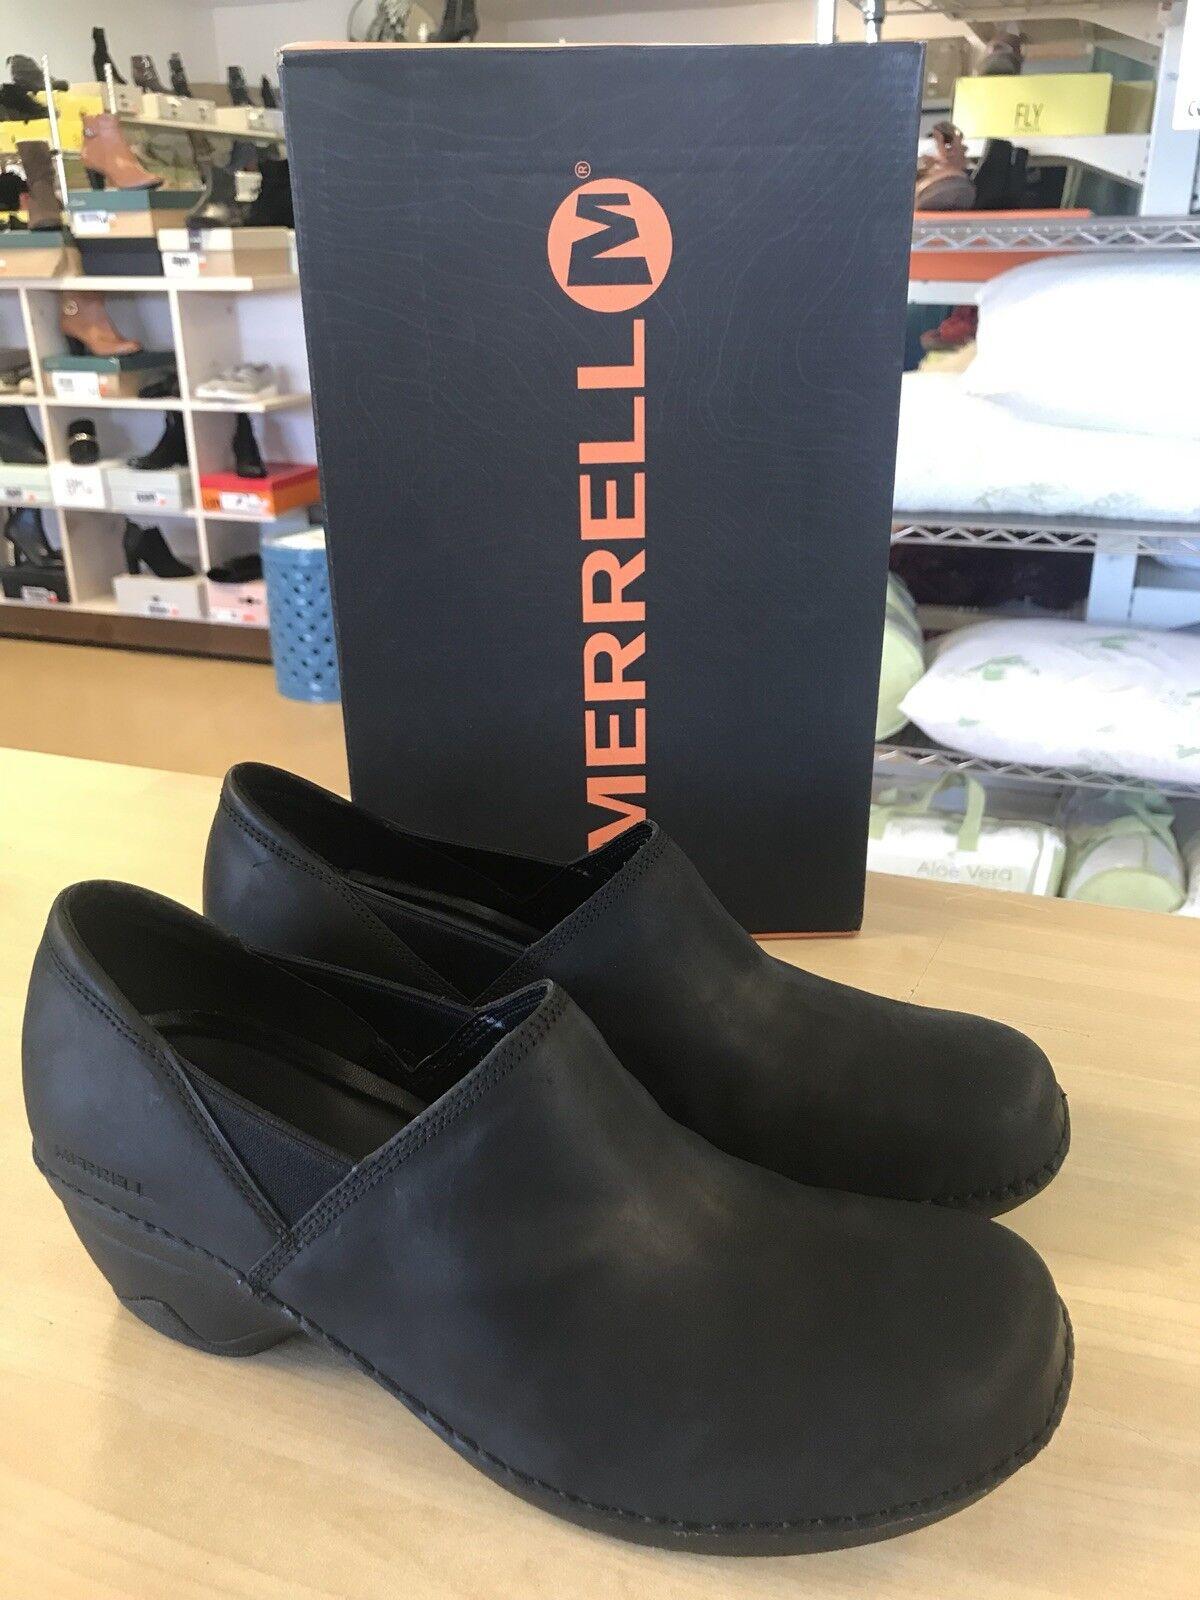 Merrell Emma Emma Emma Water Resistant Black Leather Slip-On shoes - Women's 11 Medium 43c83f